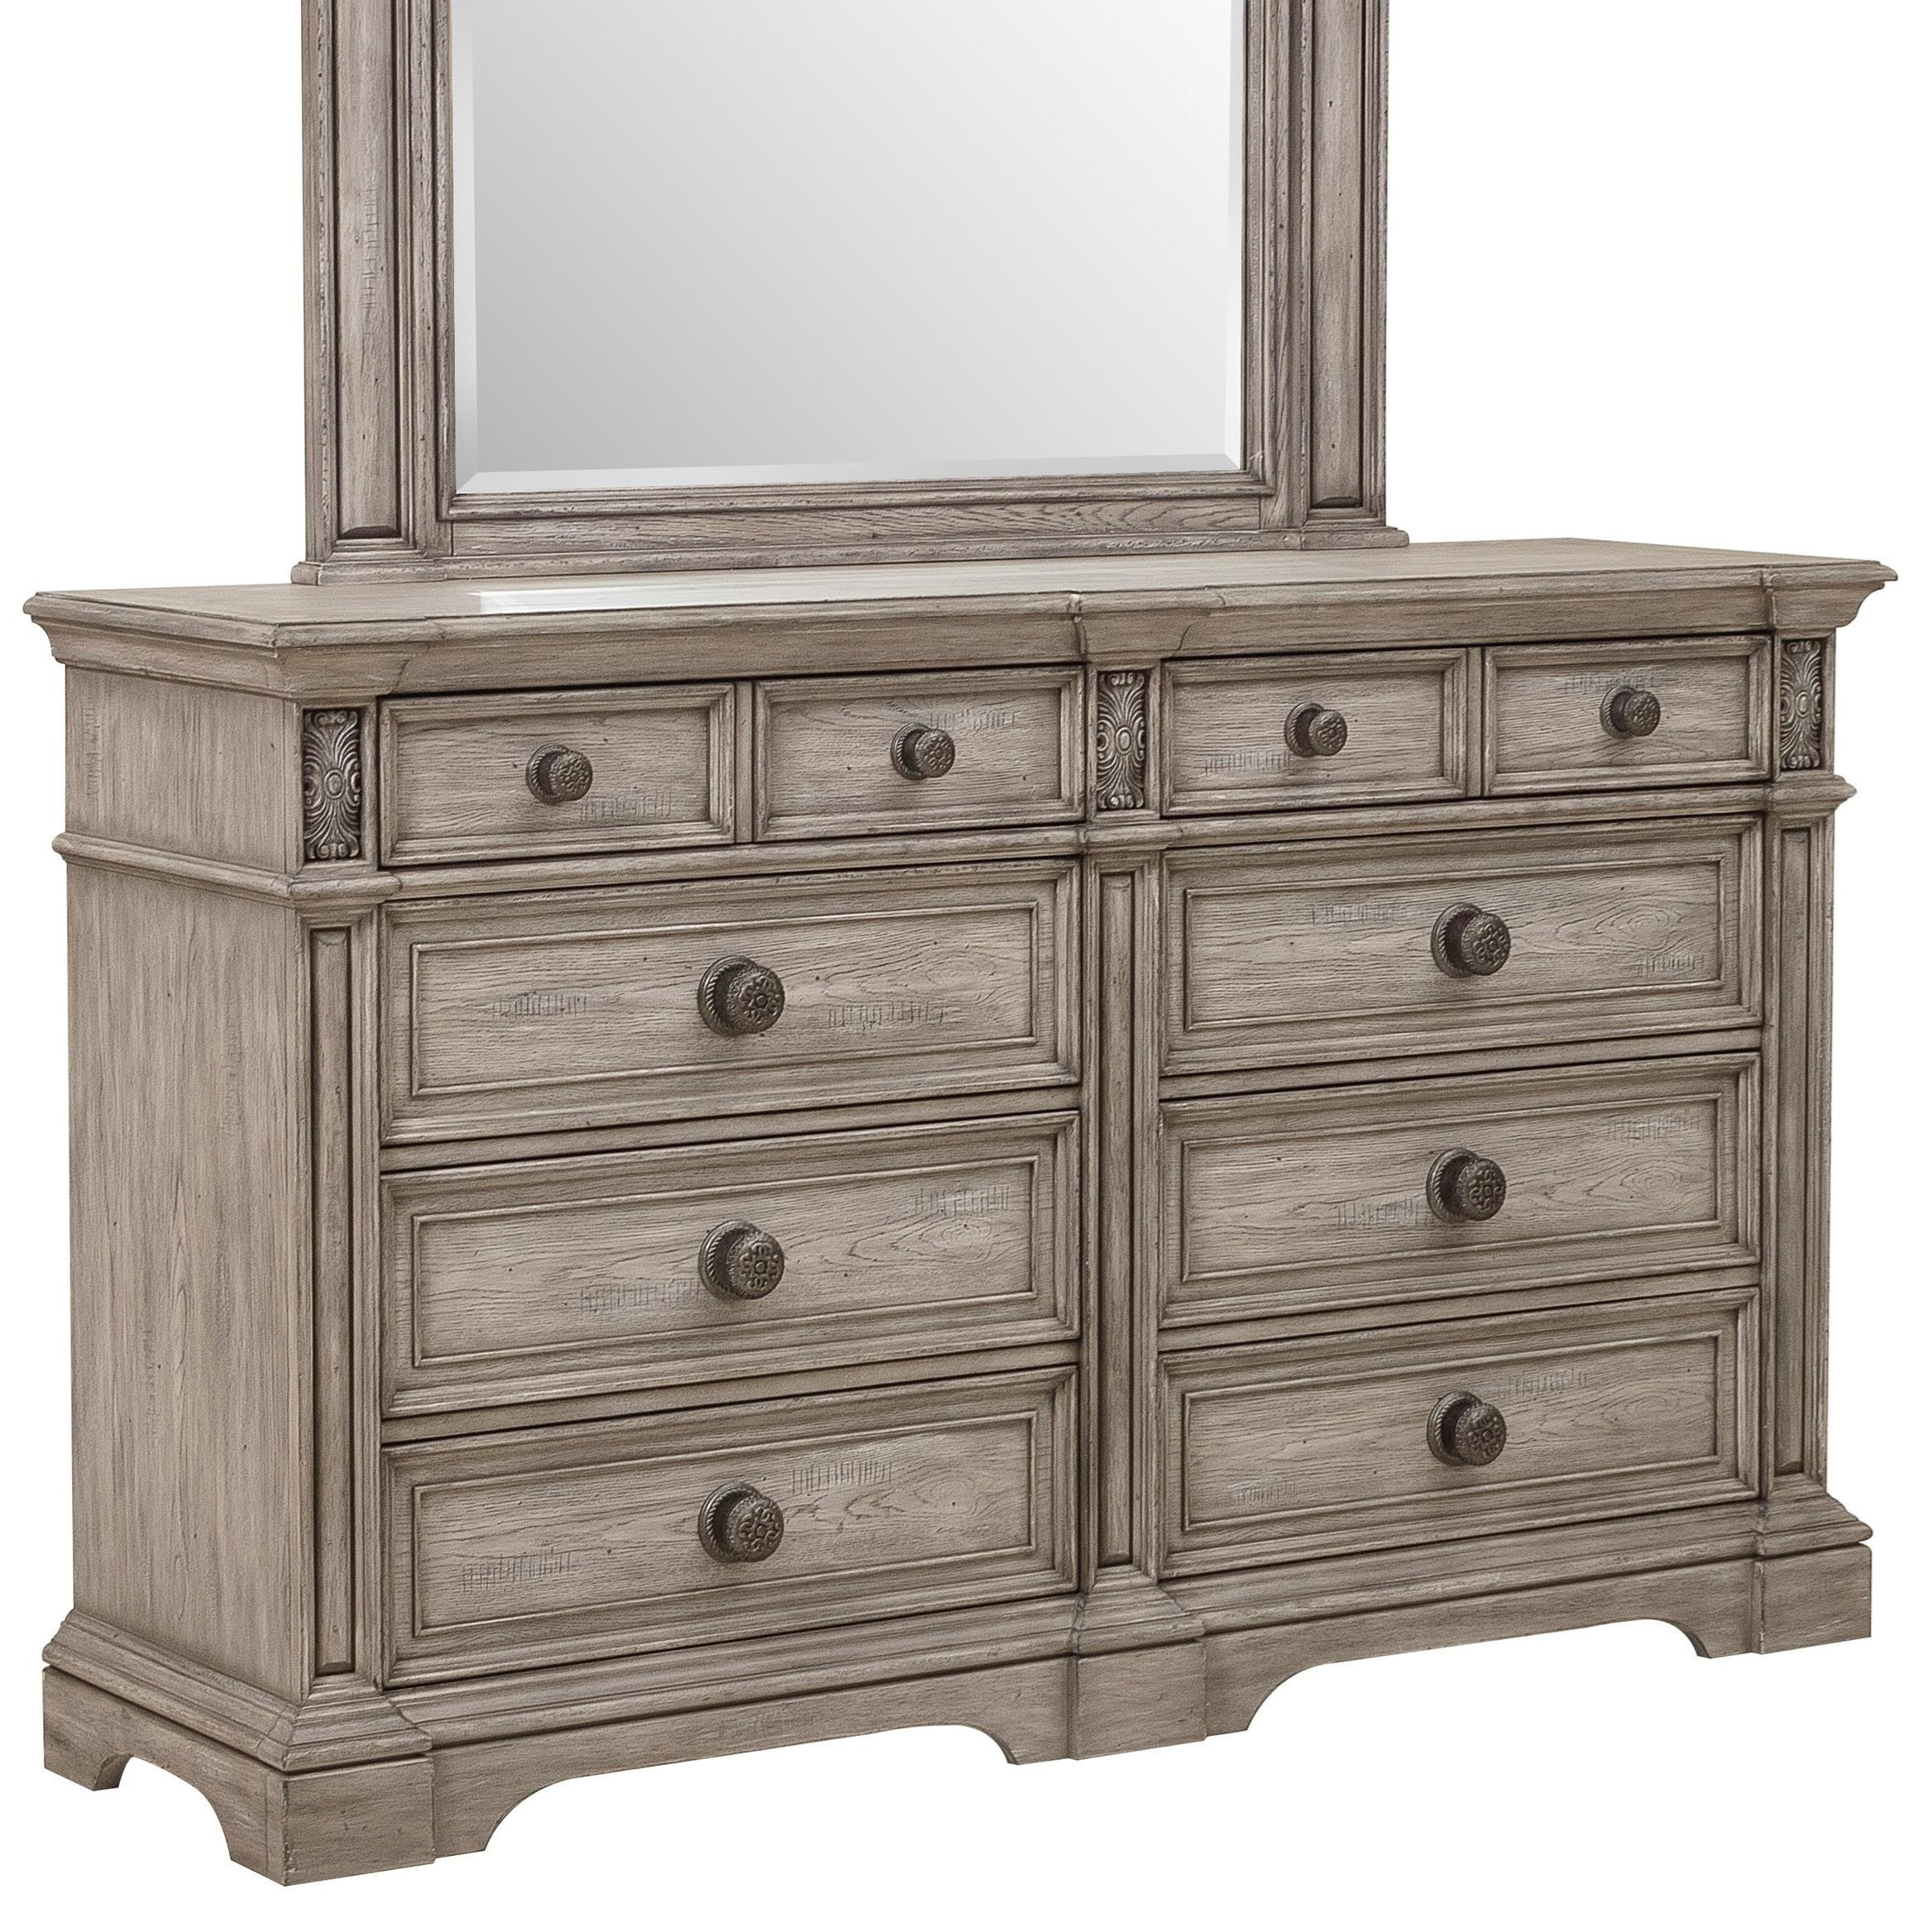 Windmere Dresser by Klaussner International at Darvin Furniture